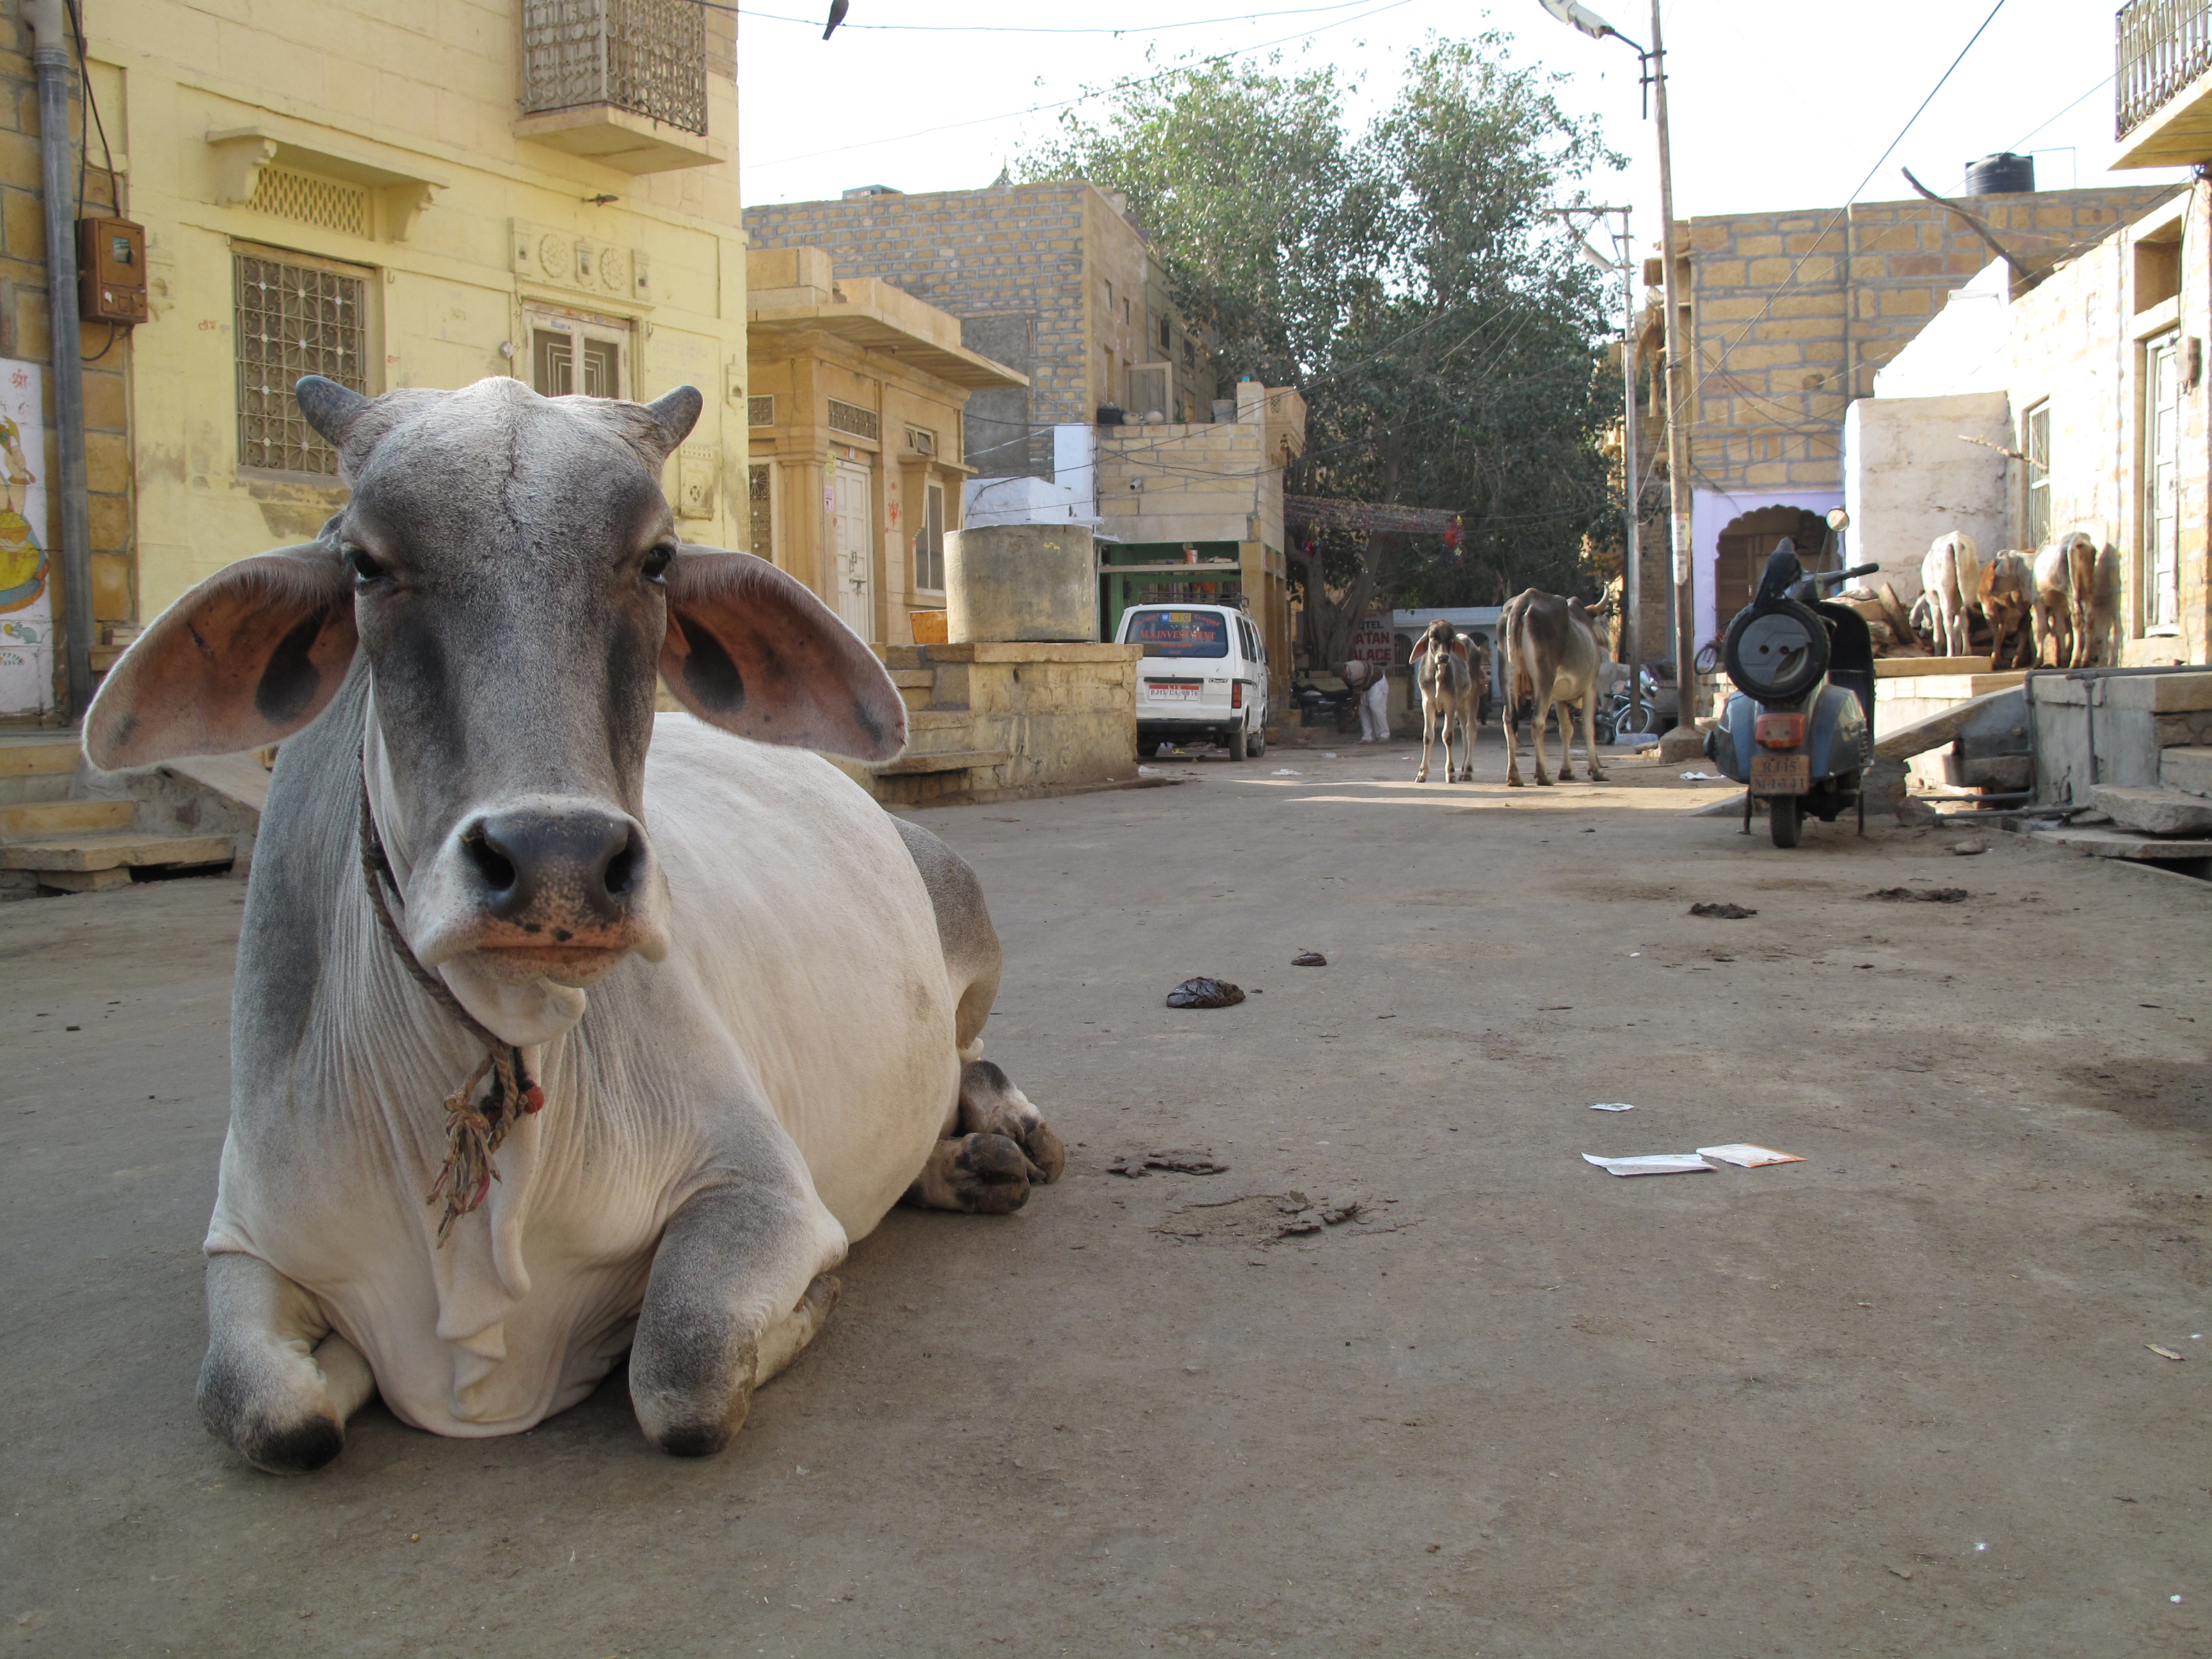 Swieta krowa